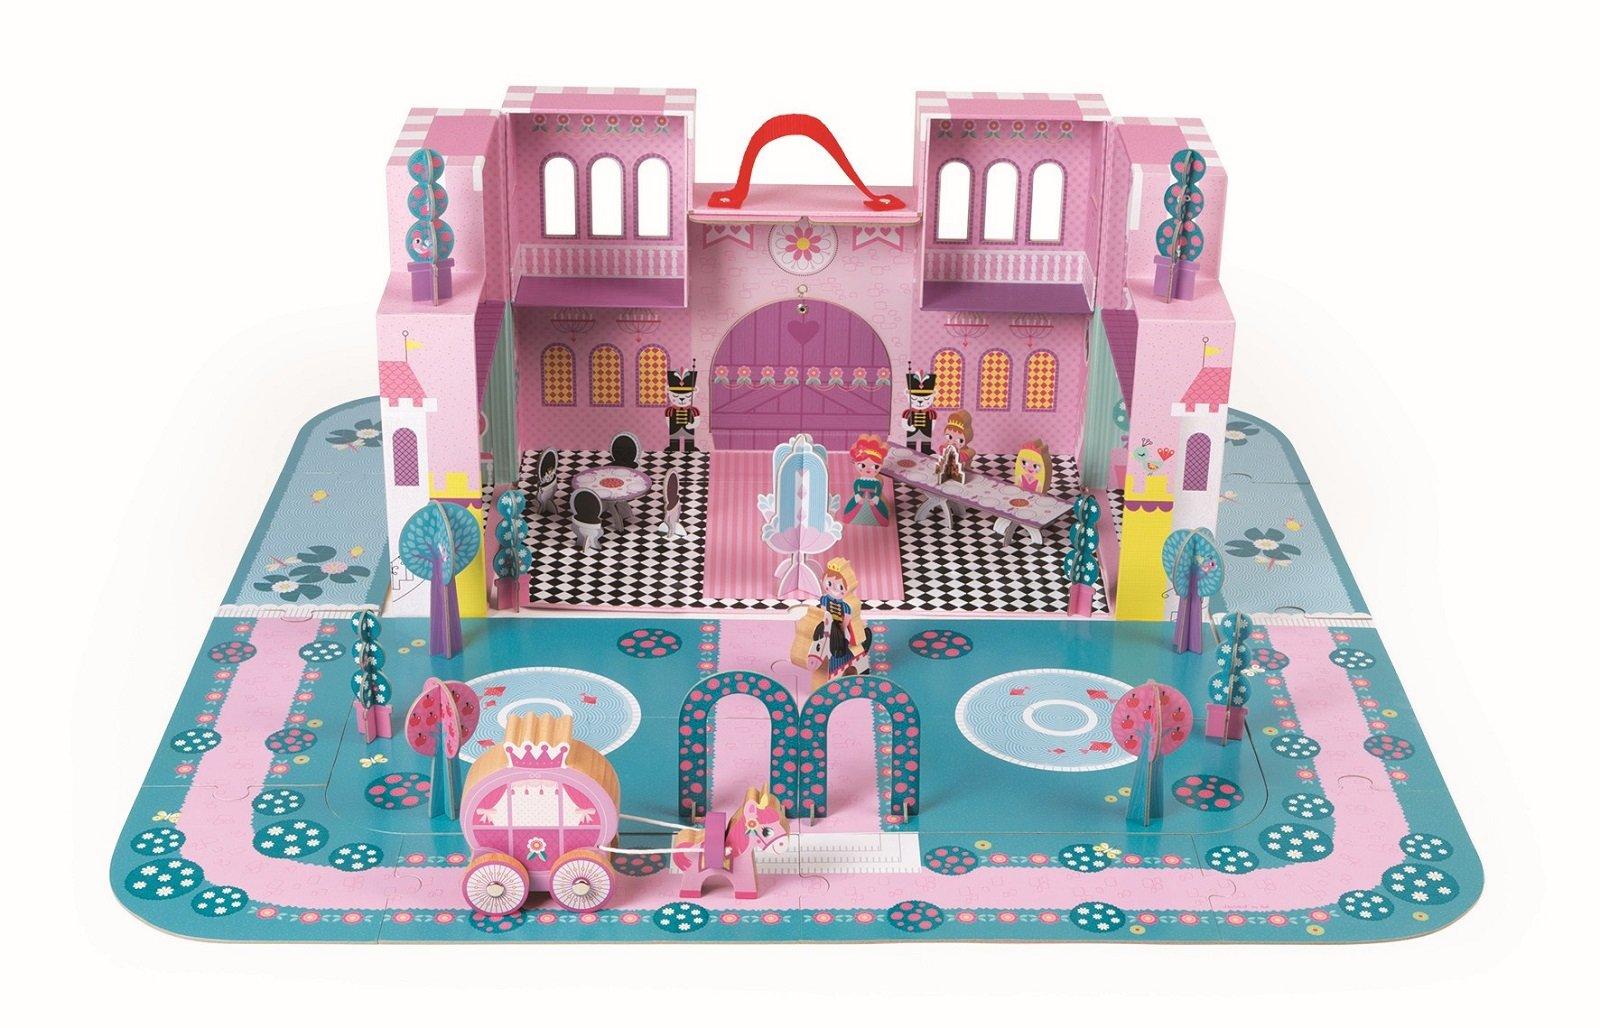 Arredare la casa delle bambole cose di casa - Jeu de construction de maison virtuel ...